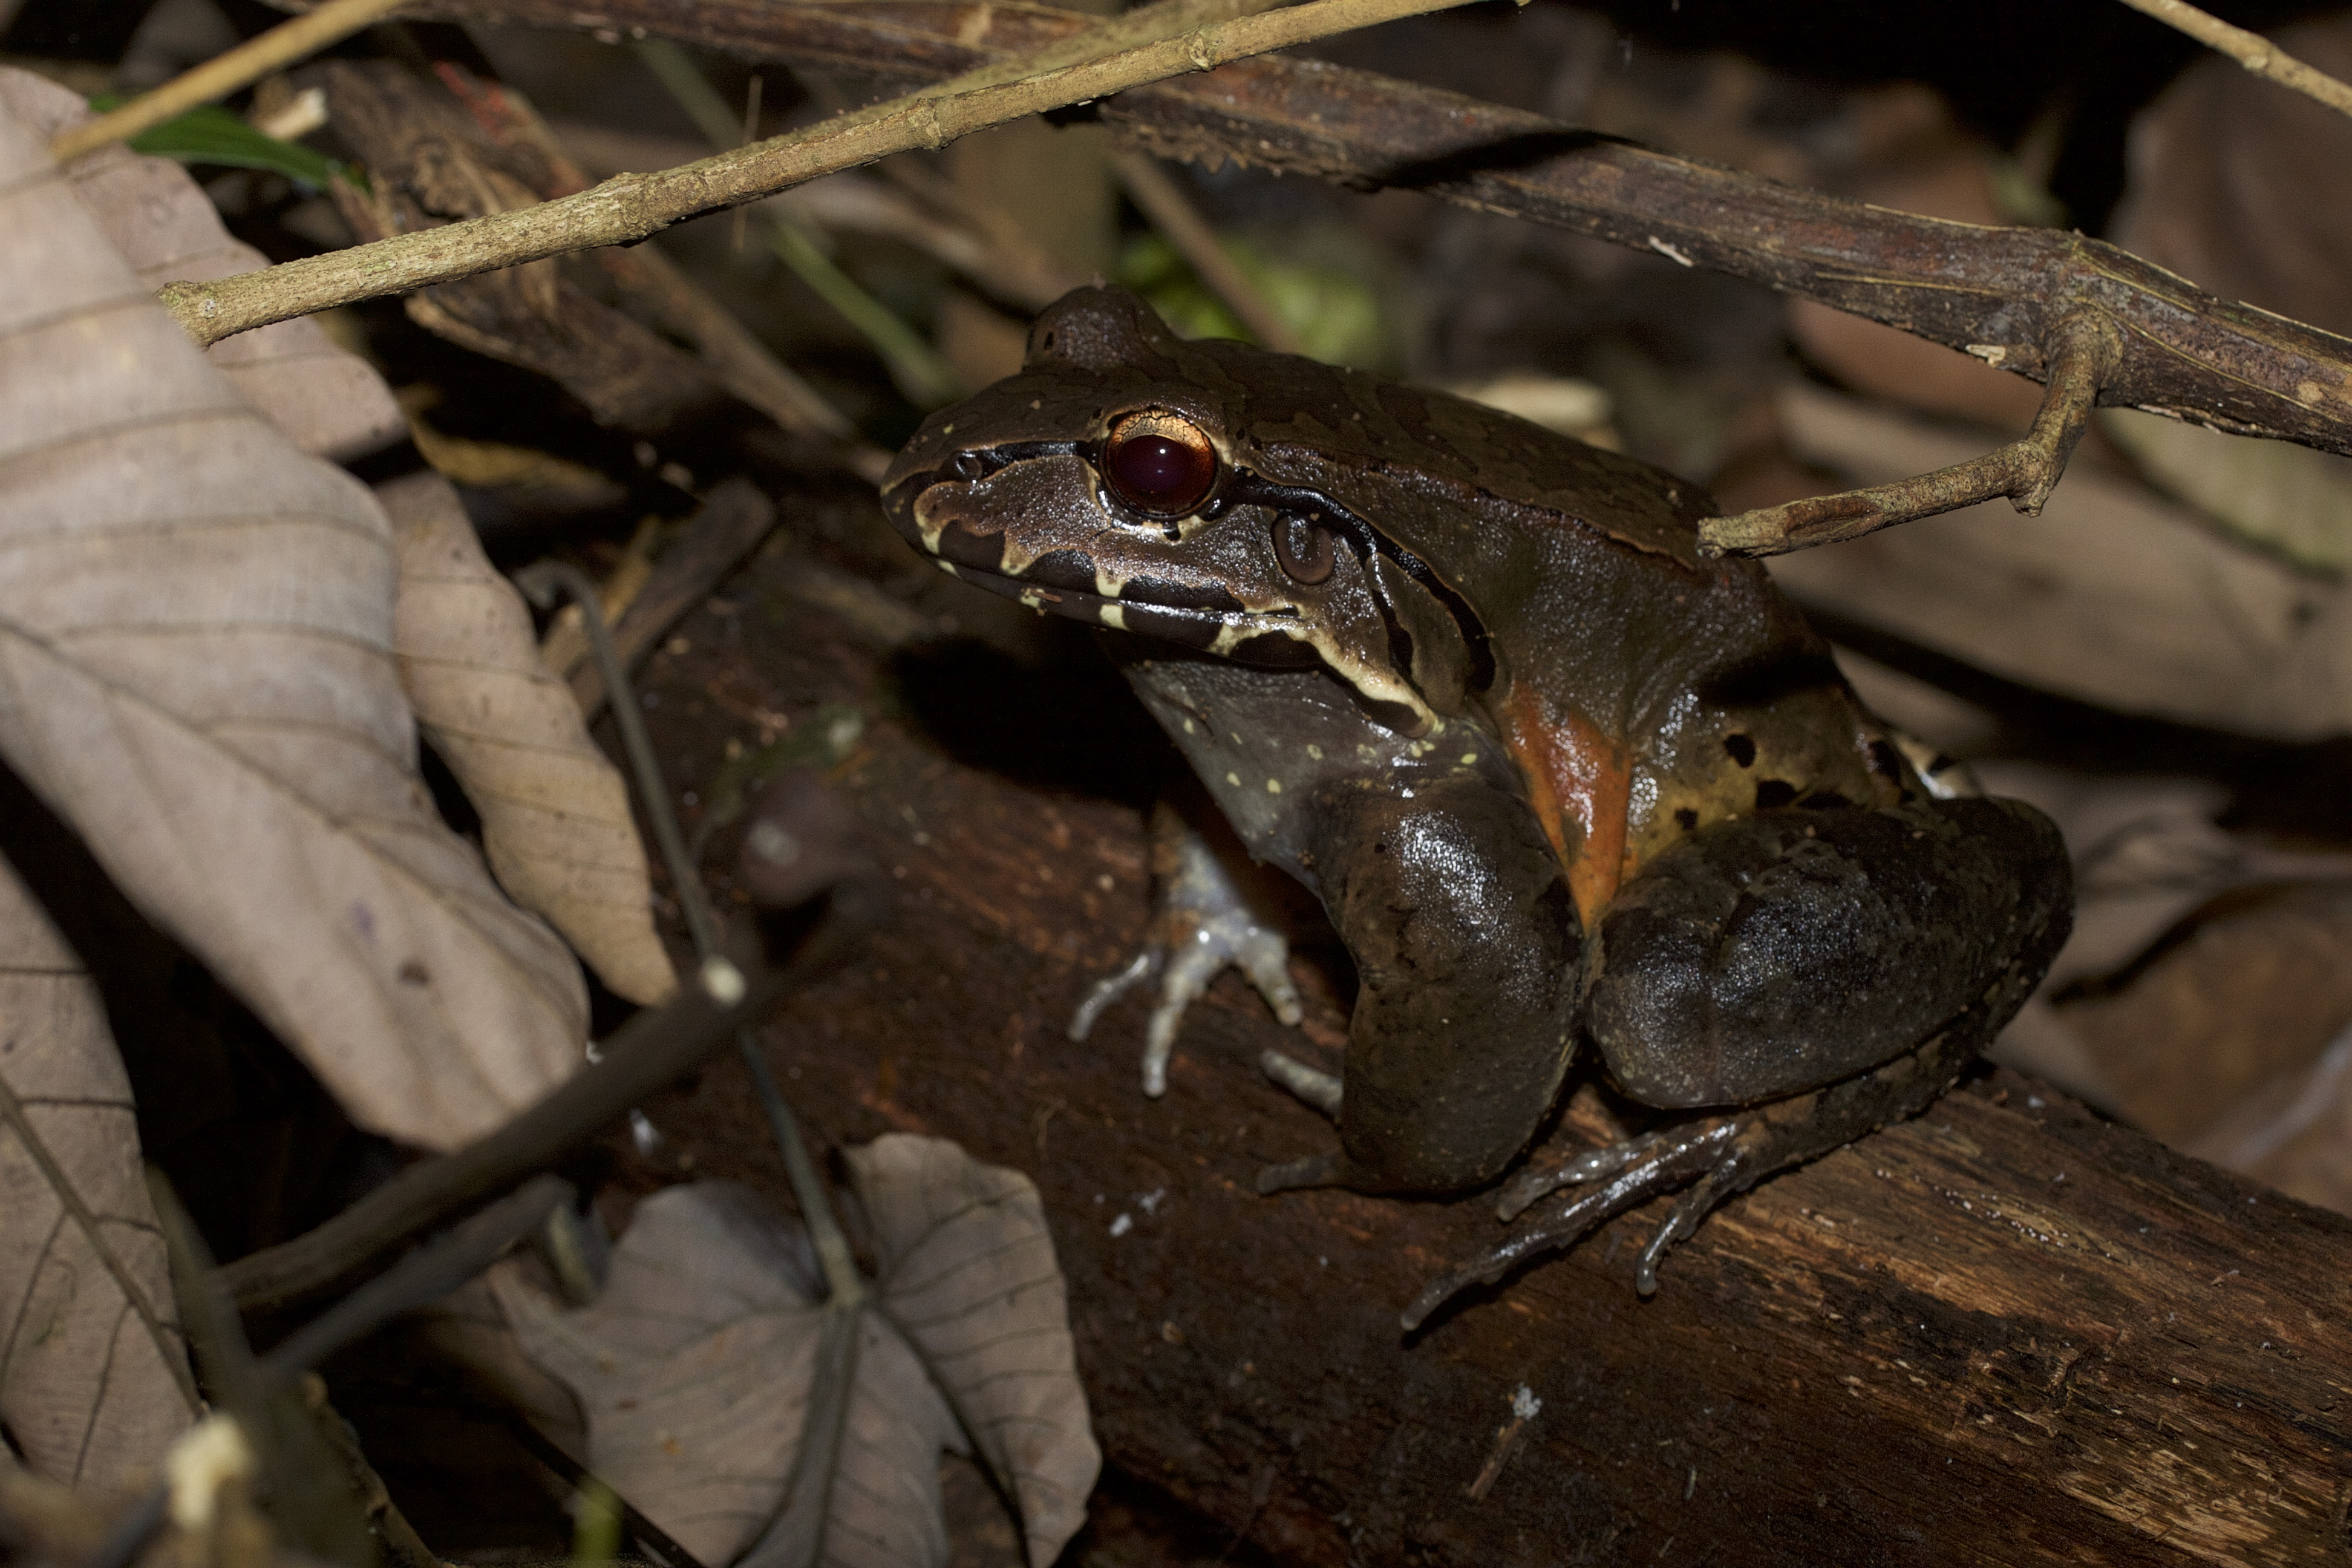 Leptodactylus savagei